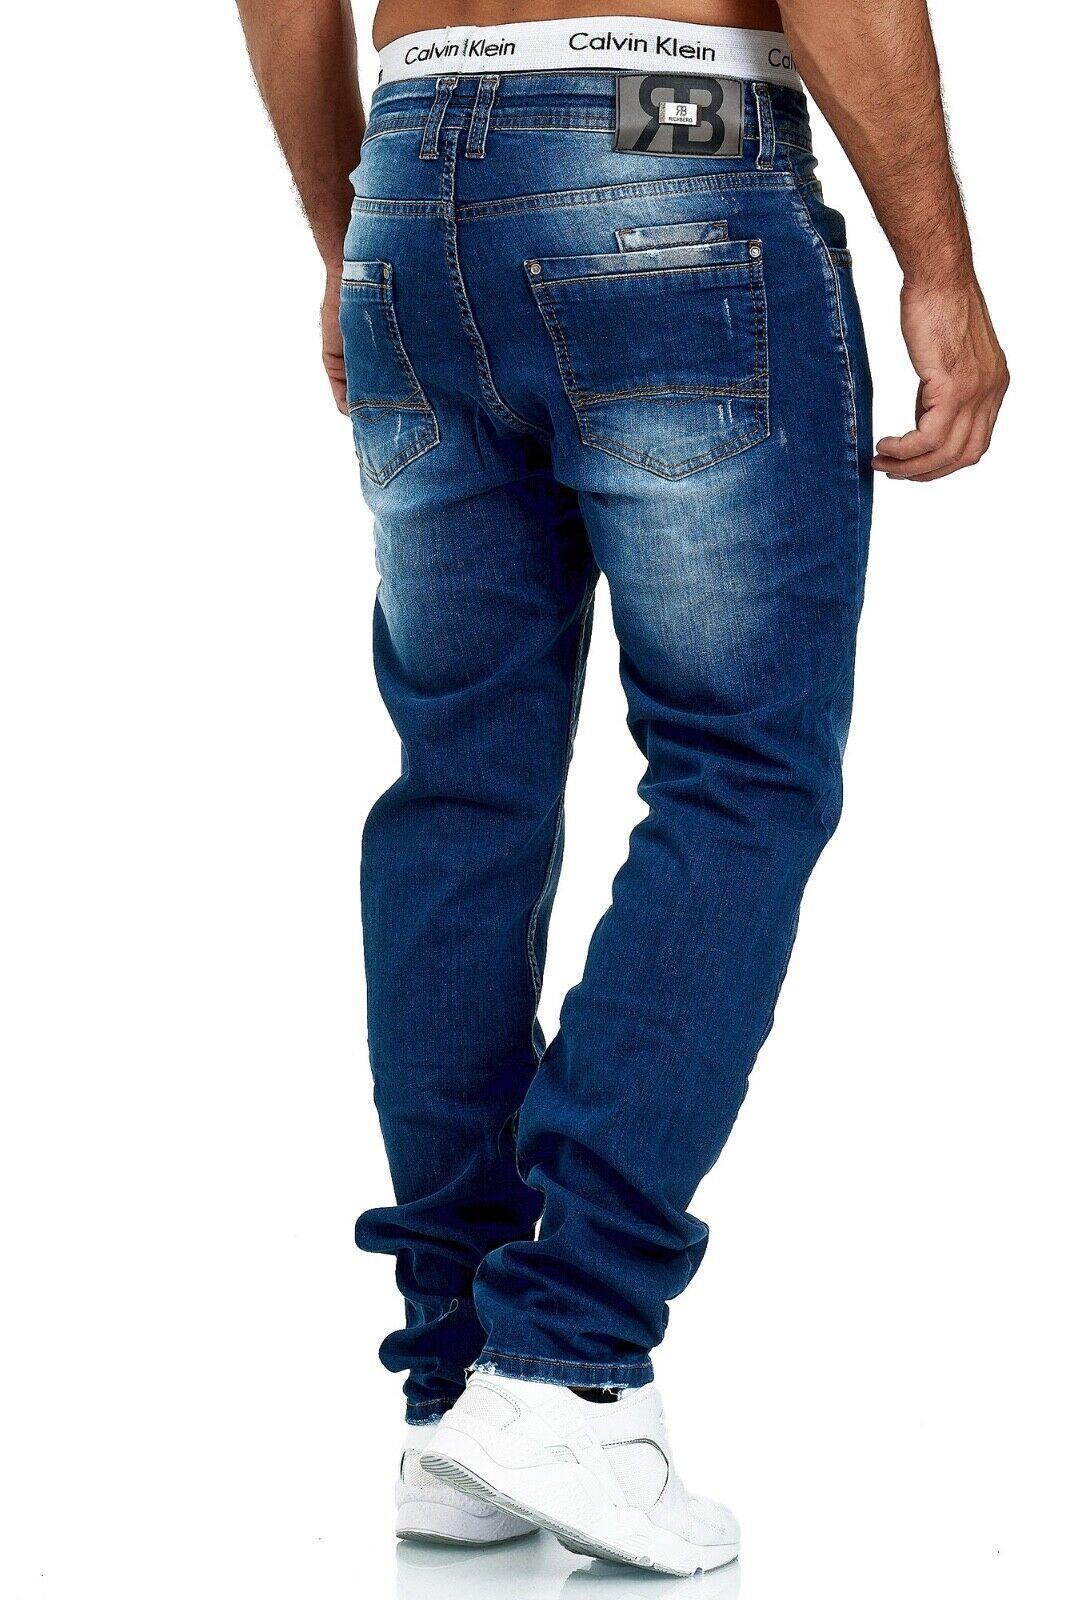 Herren-Jeans-Hose-Denim-KC-Black-Washed-Straight-Cut-Regular-Dicke-Naht-naehte Indexbild 39